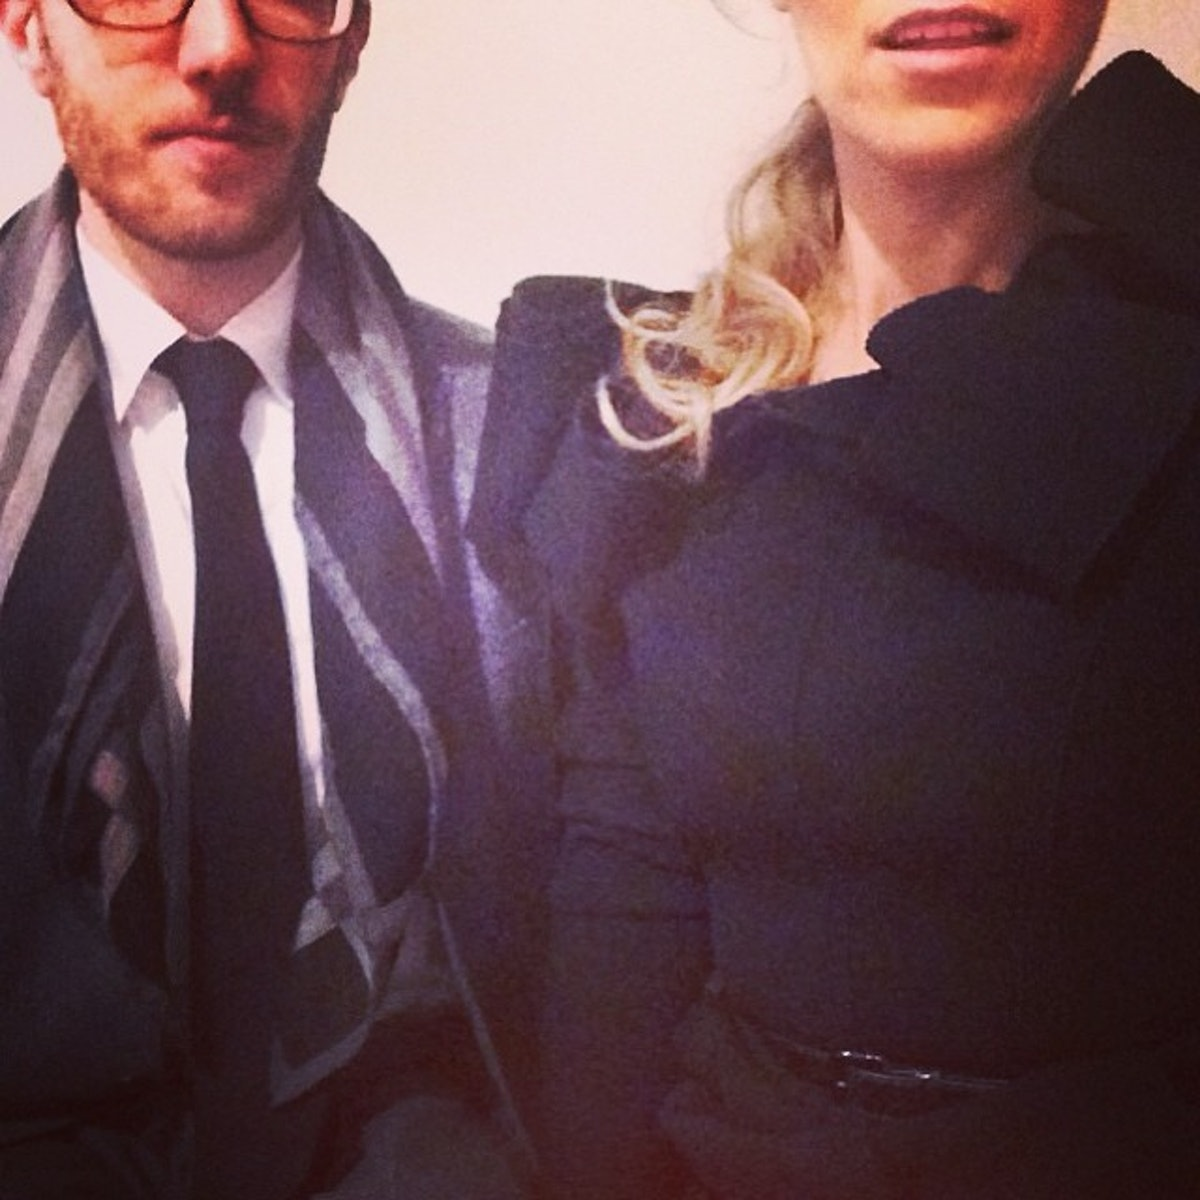 Thank you Bottega Veneta for the lovely clothes